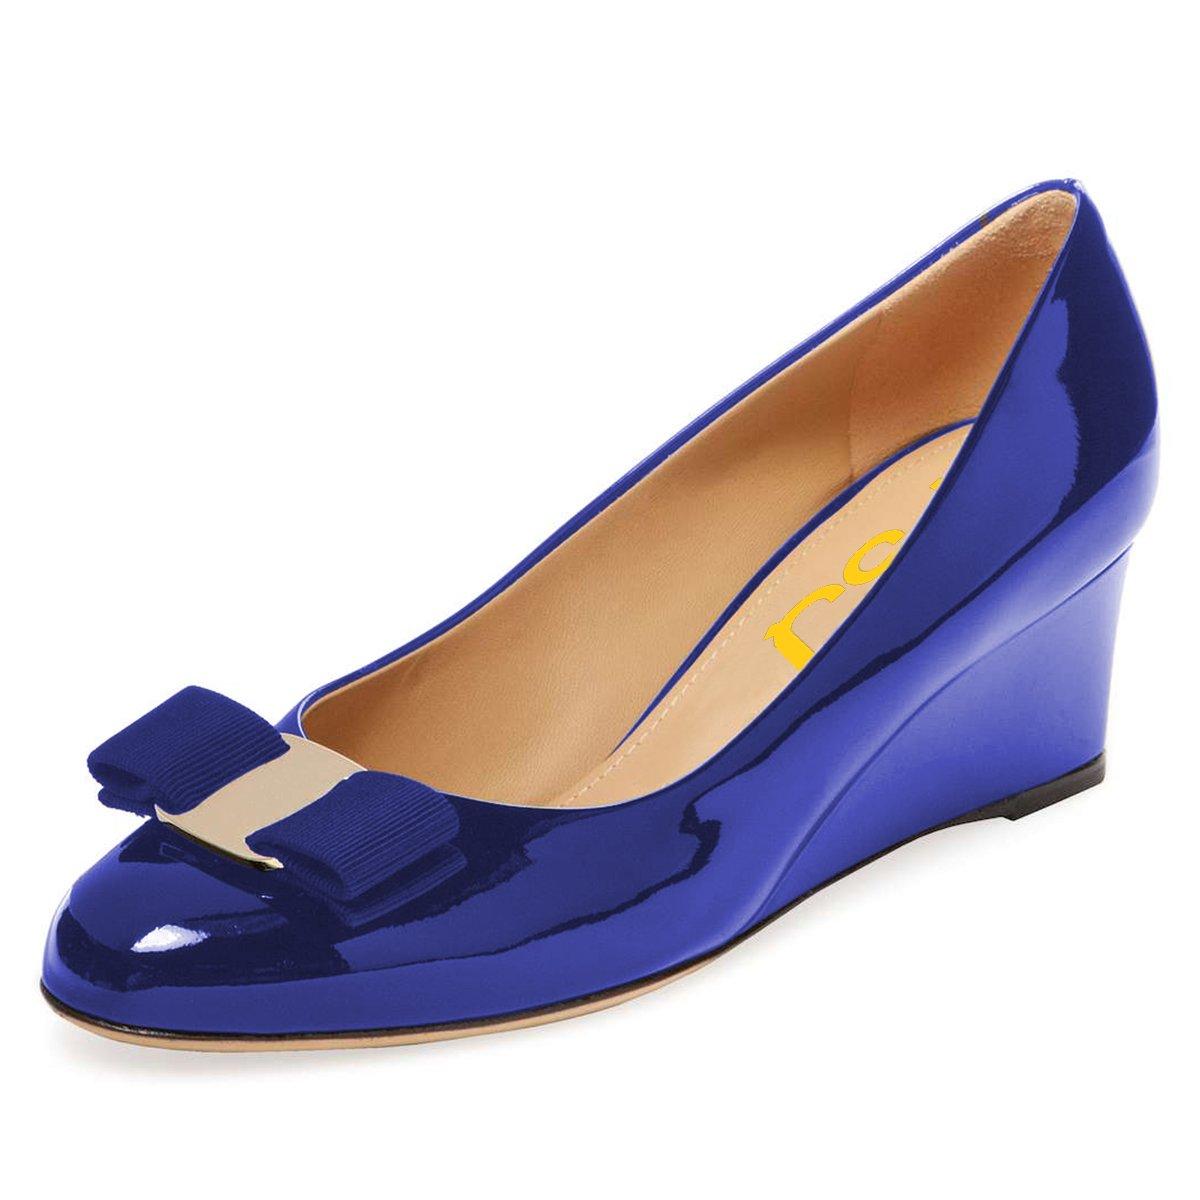 FSJ Women Elegant High Wedge Heels Pumps Closed Toe Comfort Bow Formal Dress Shoes Size 8 Royal Blue